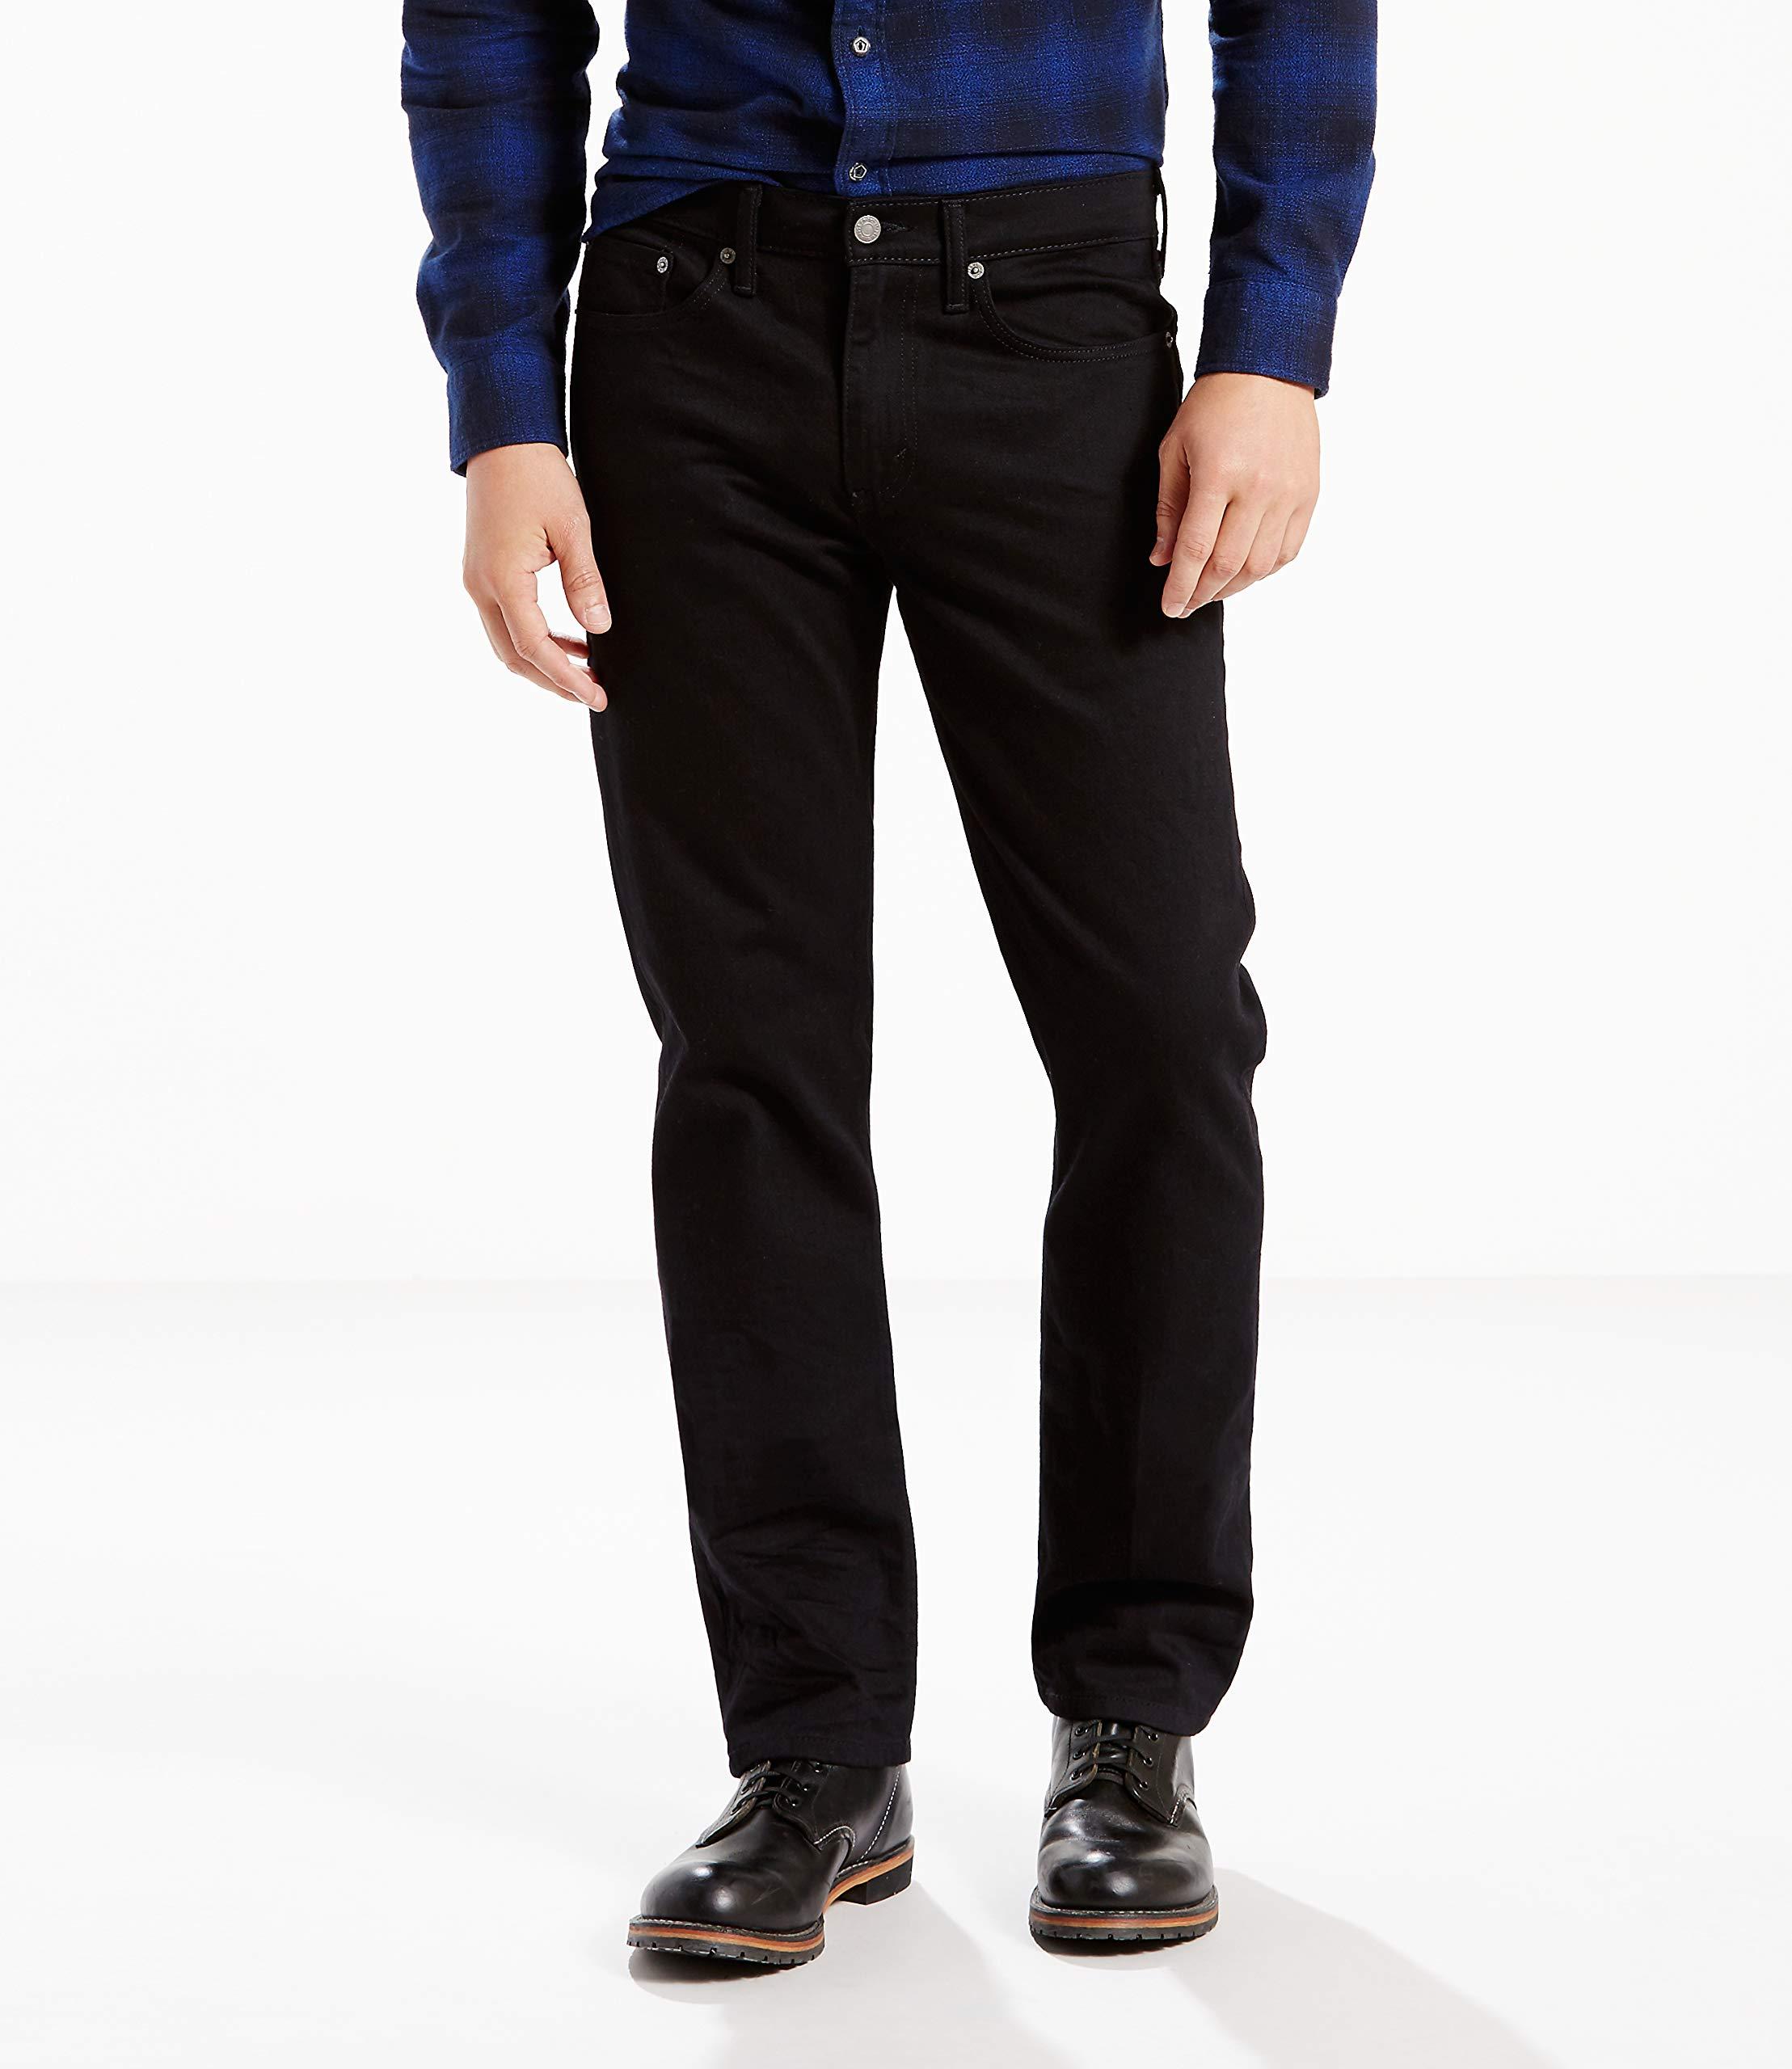 Levi's Men's 514 Straight fit Stretch Jean,  Black, 32x32 by Levi's